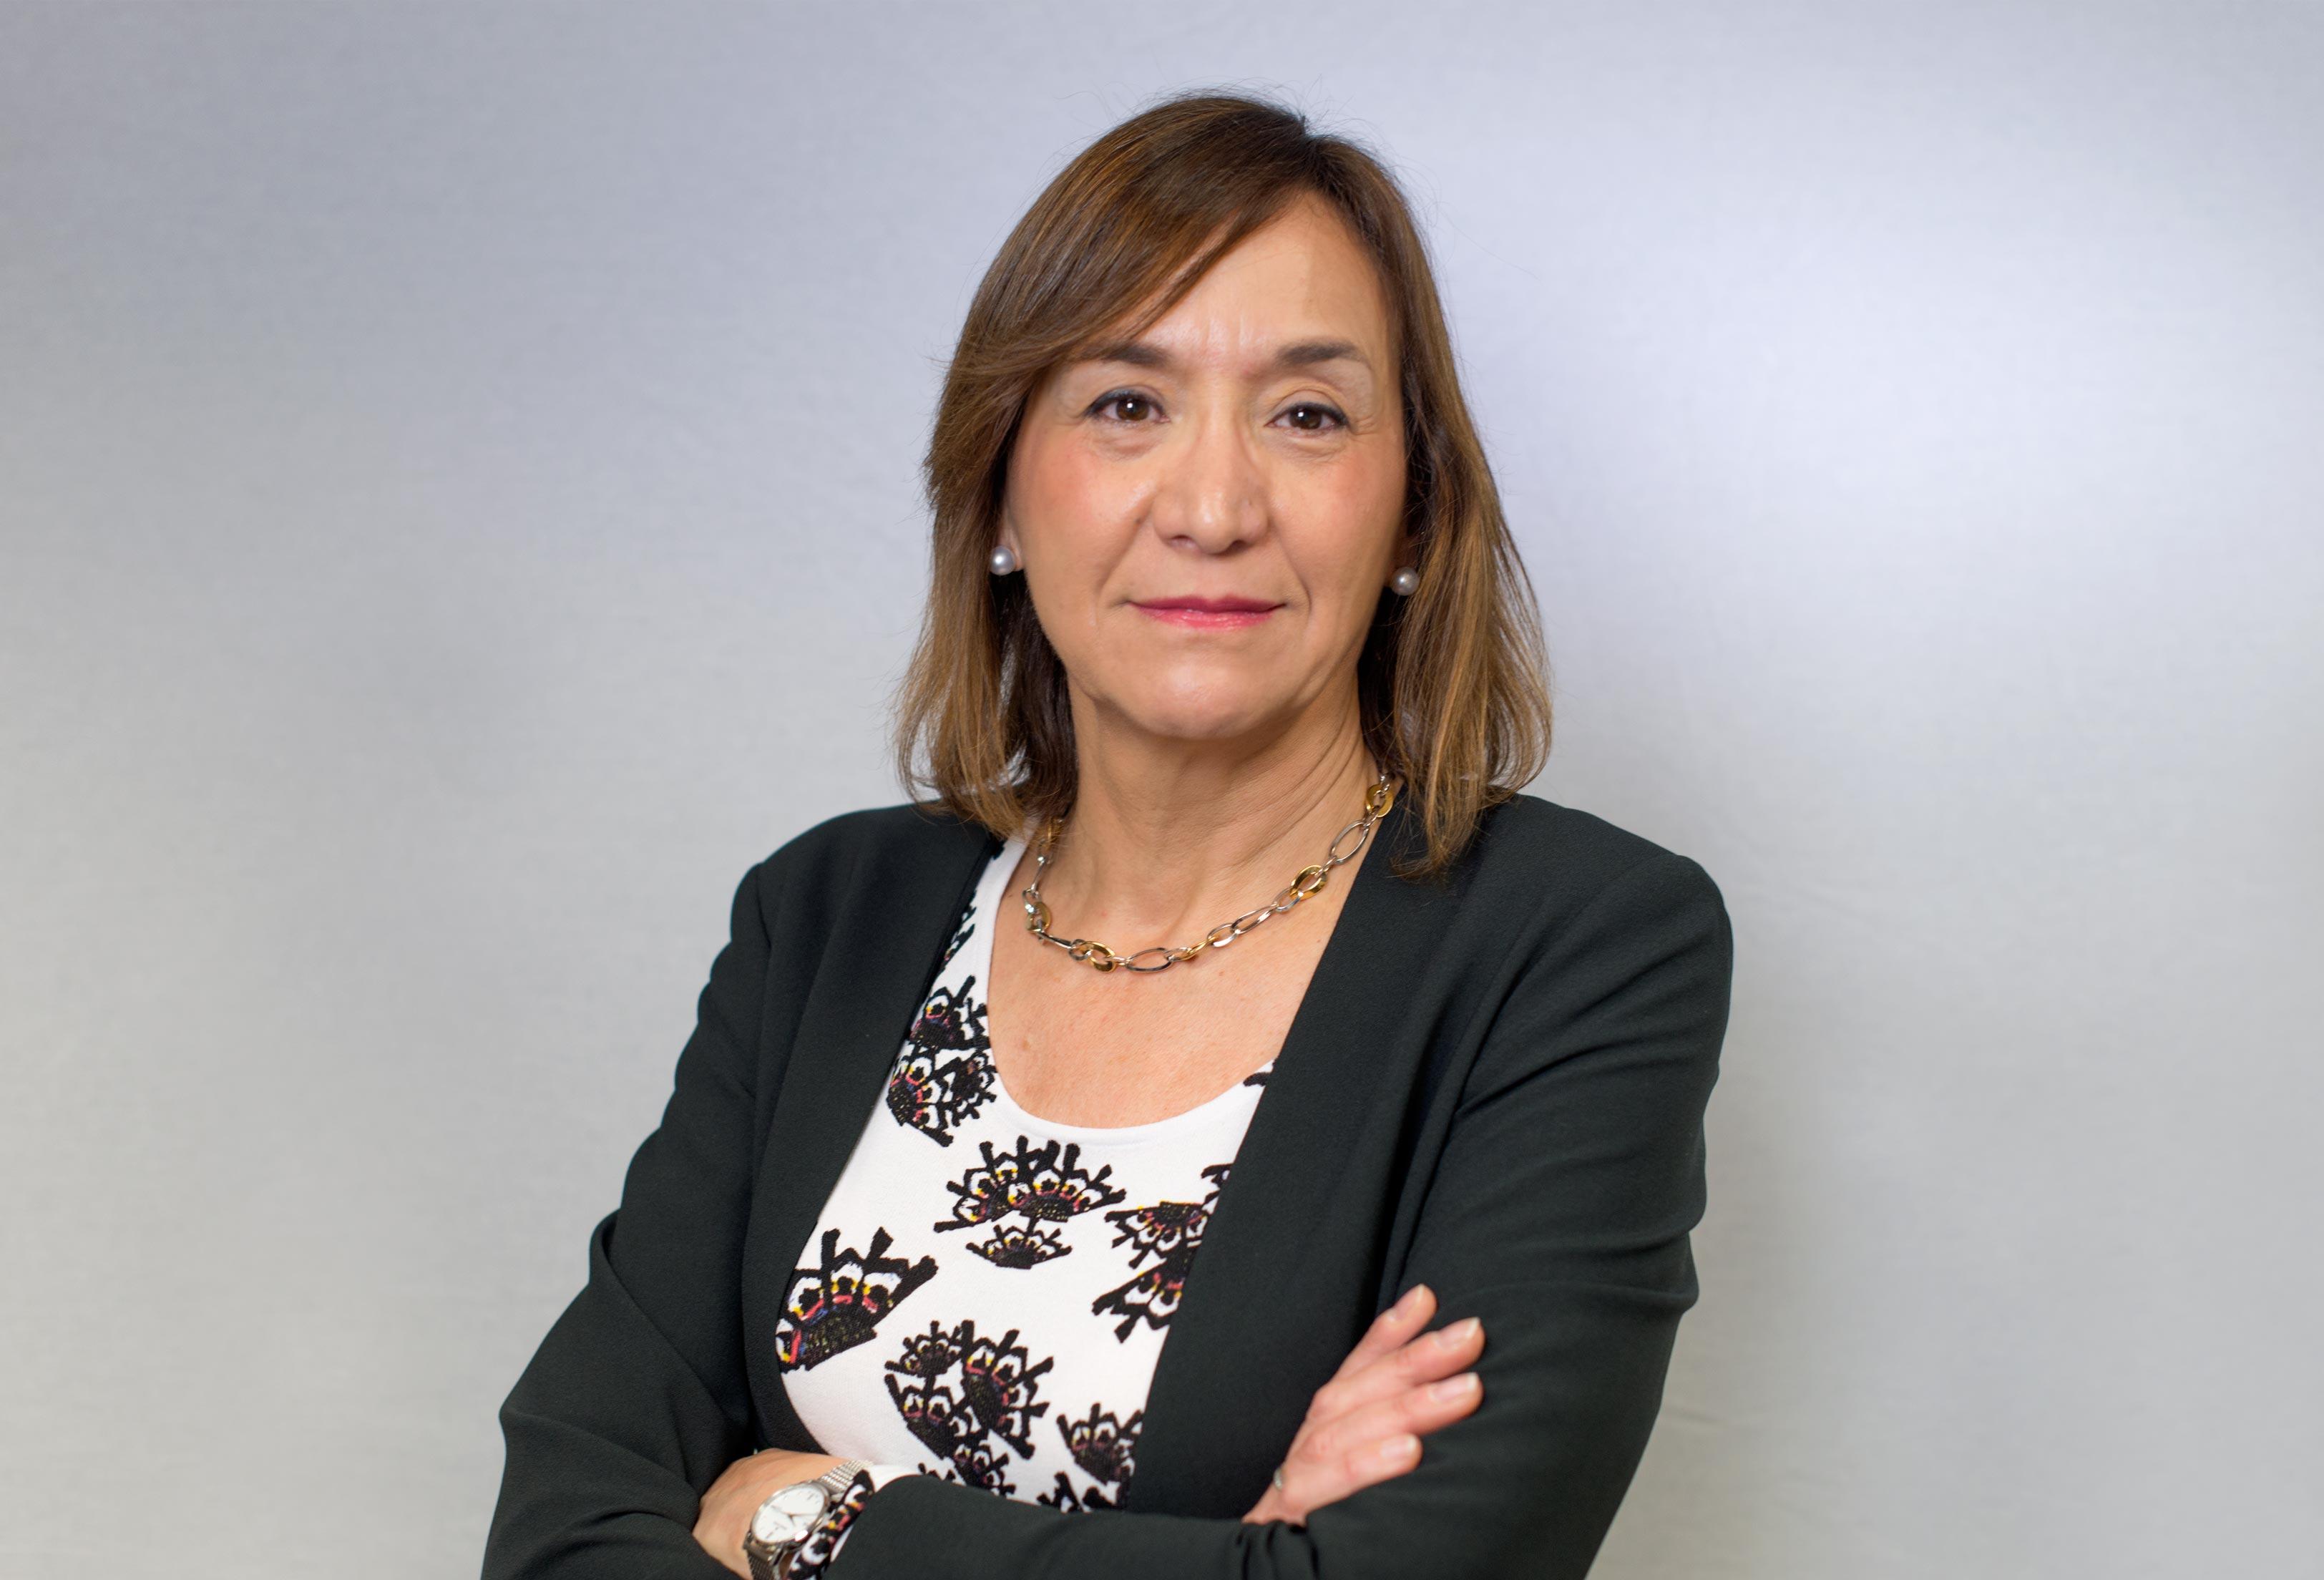 Mercedes Corrales Valentín-Gamazo